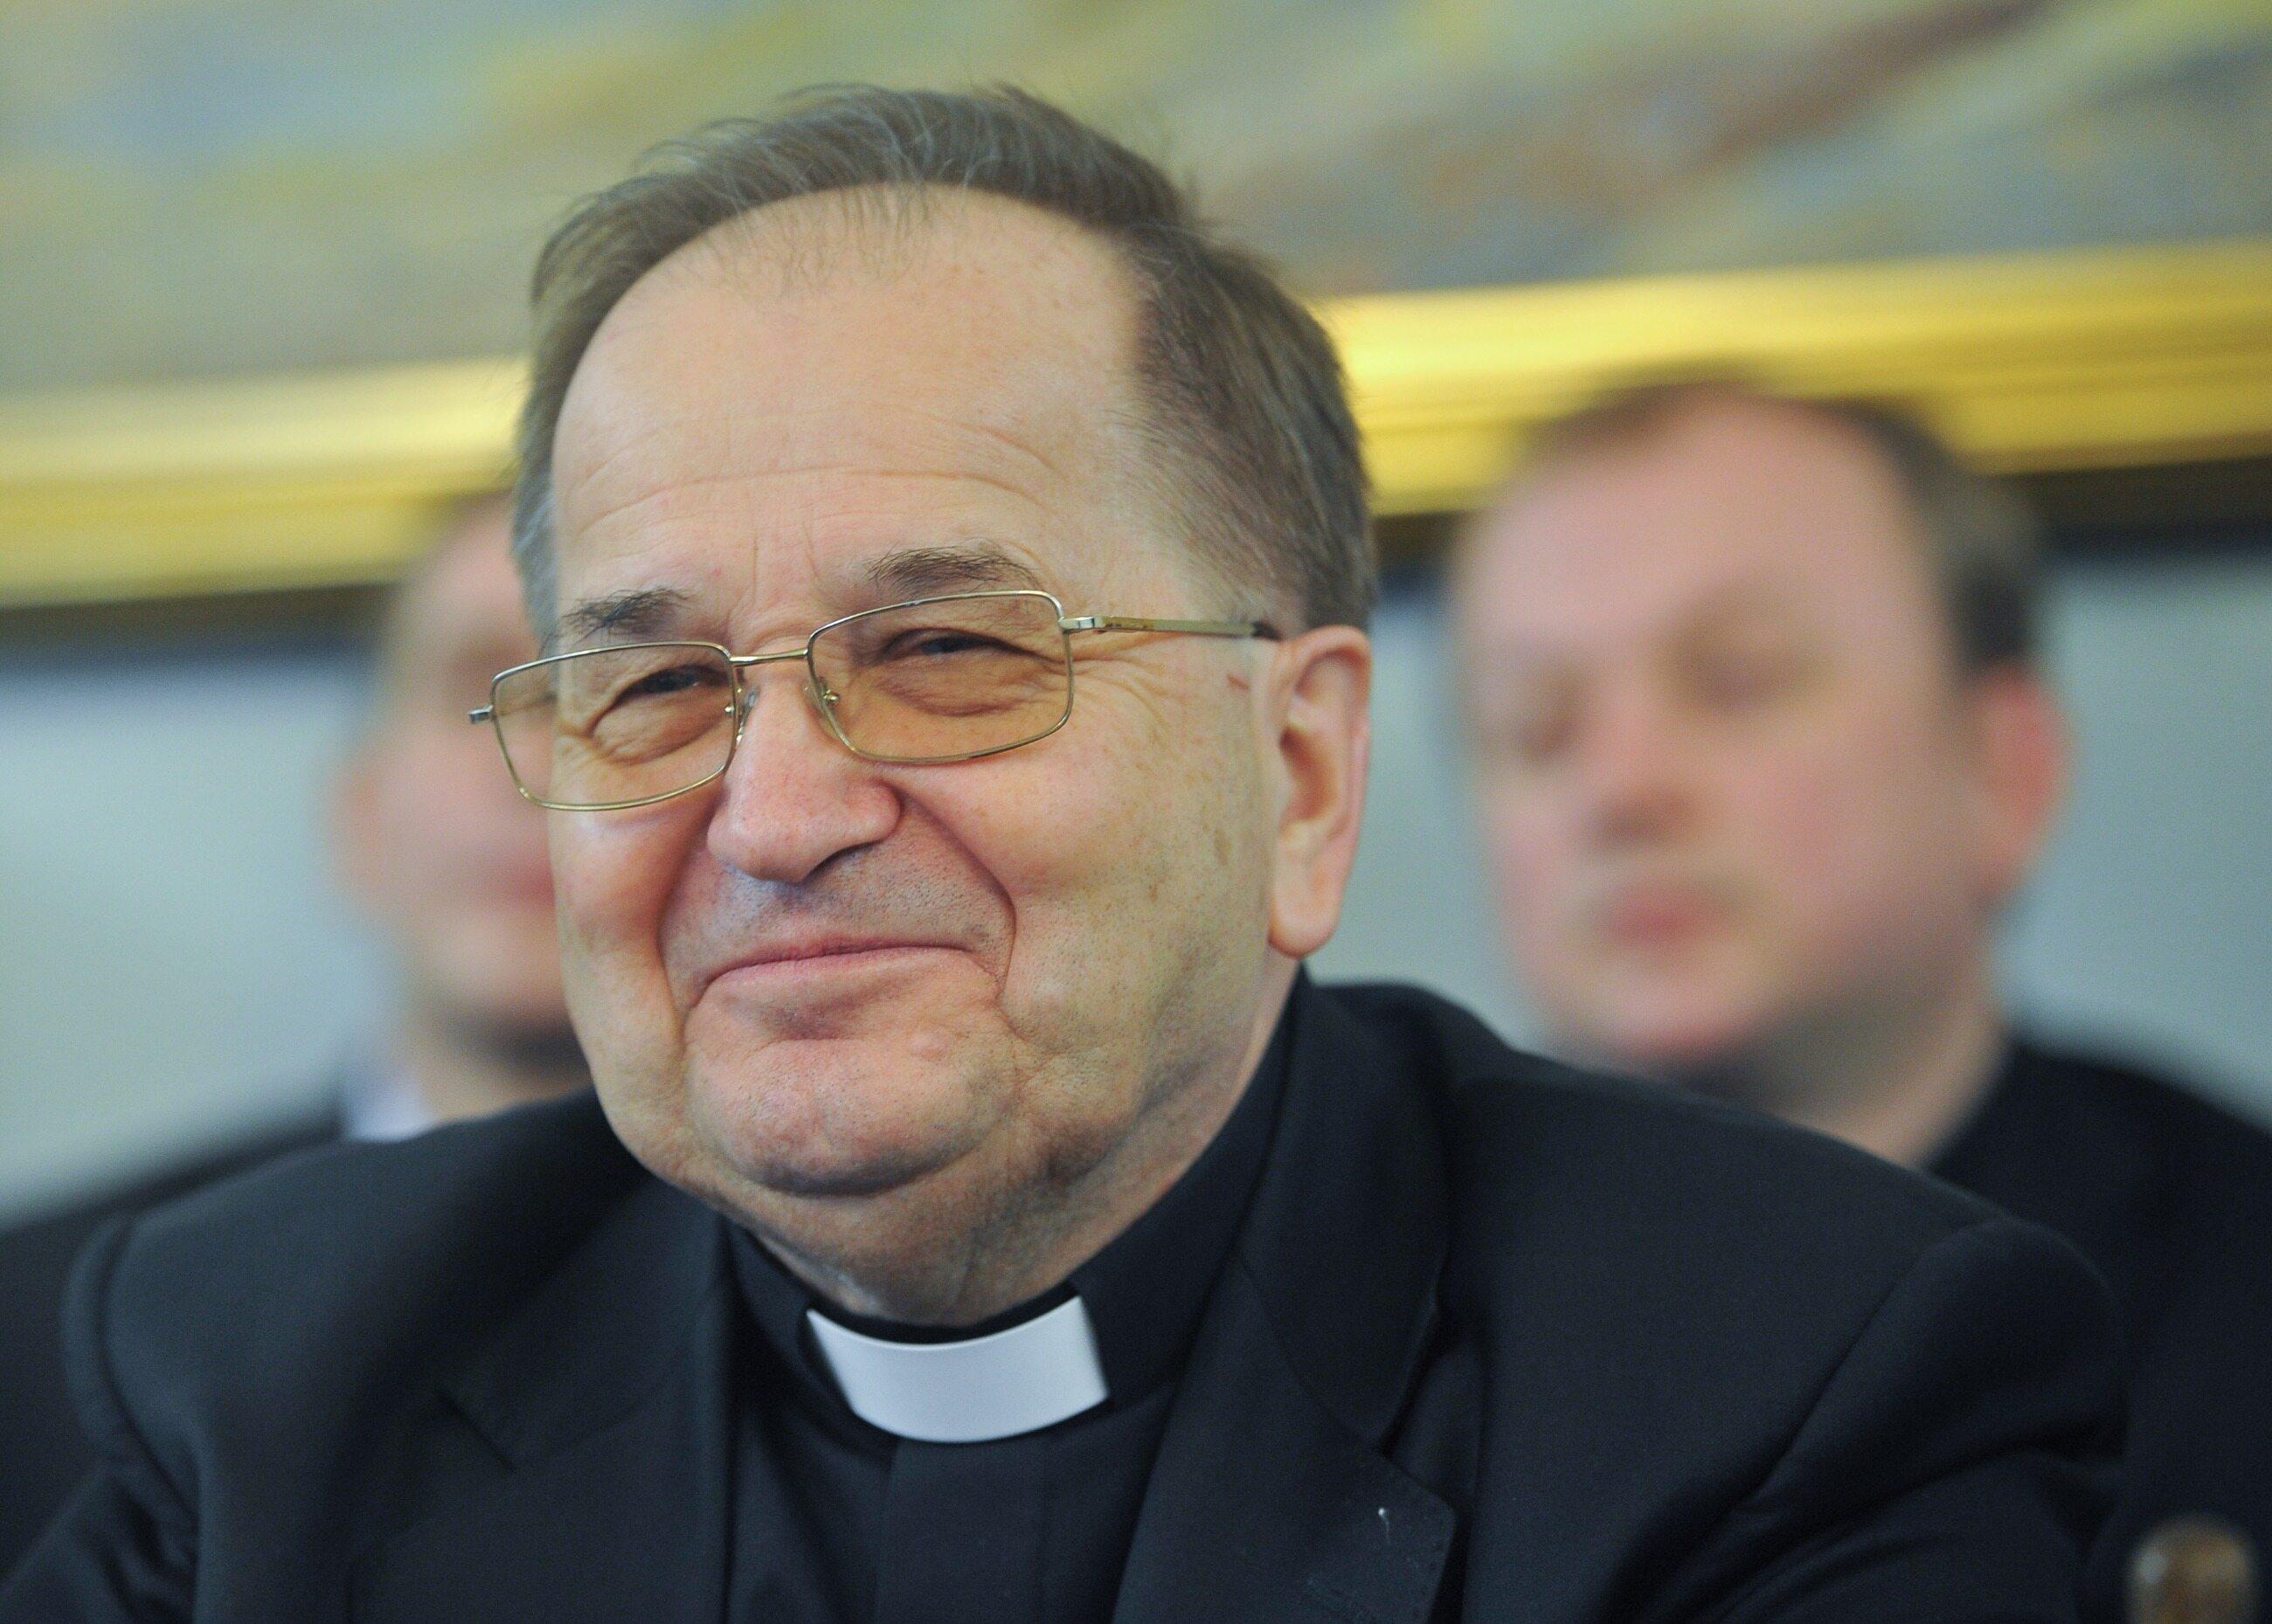 Tadeusz Rydzyk